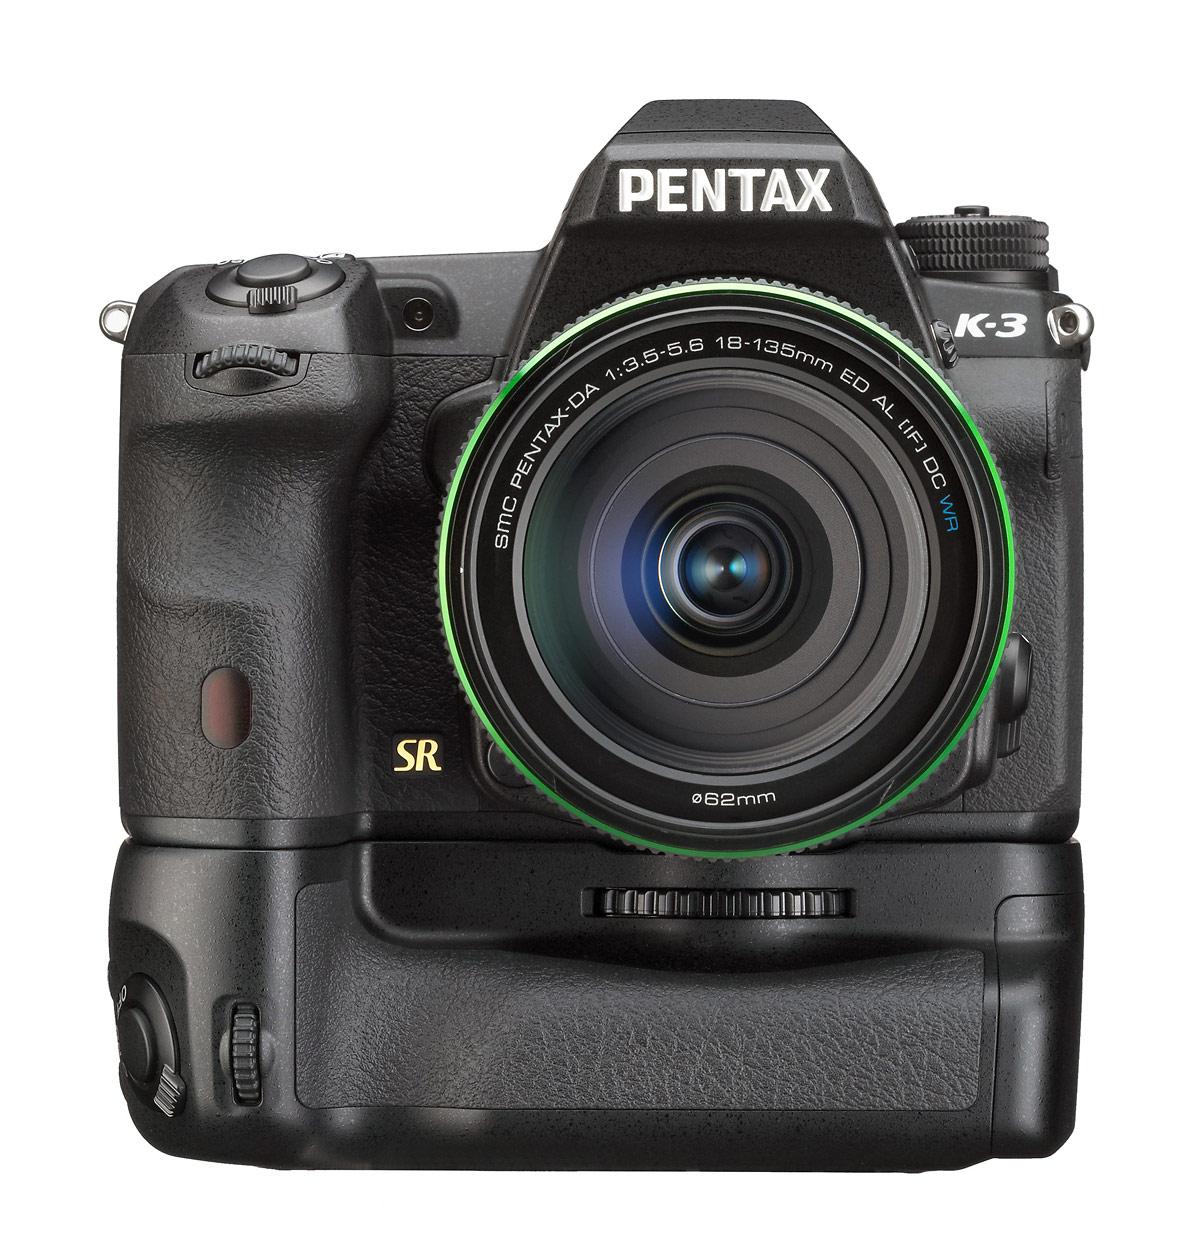 Pentax K-3 DSLR With Battery Grip